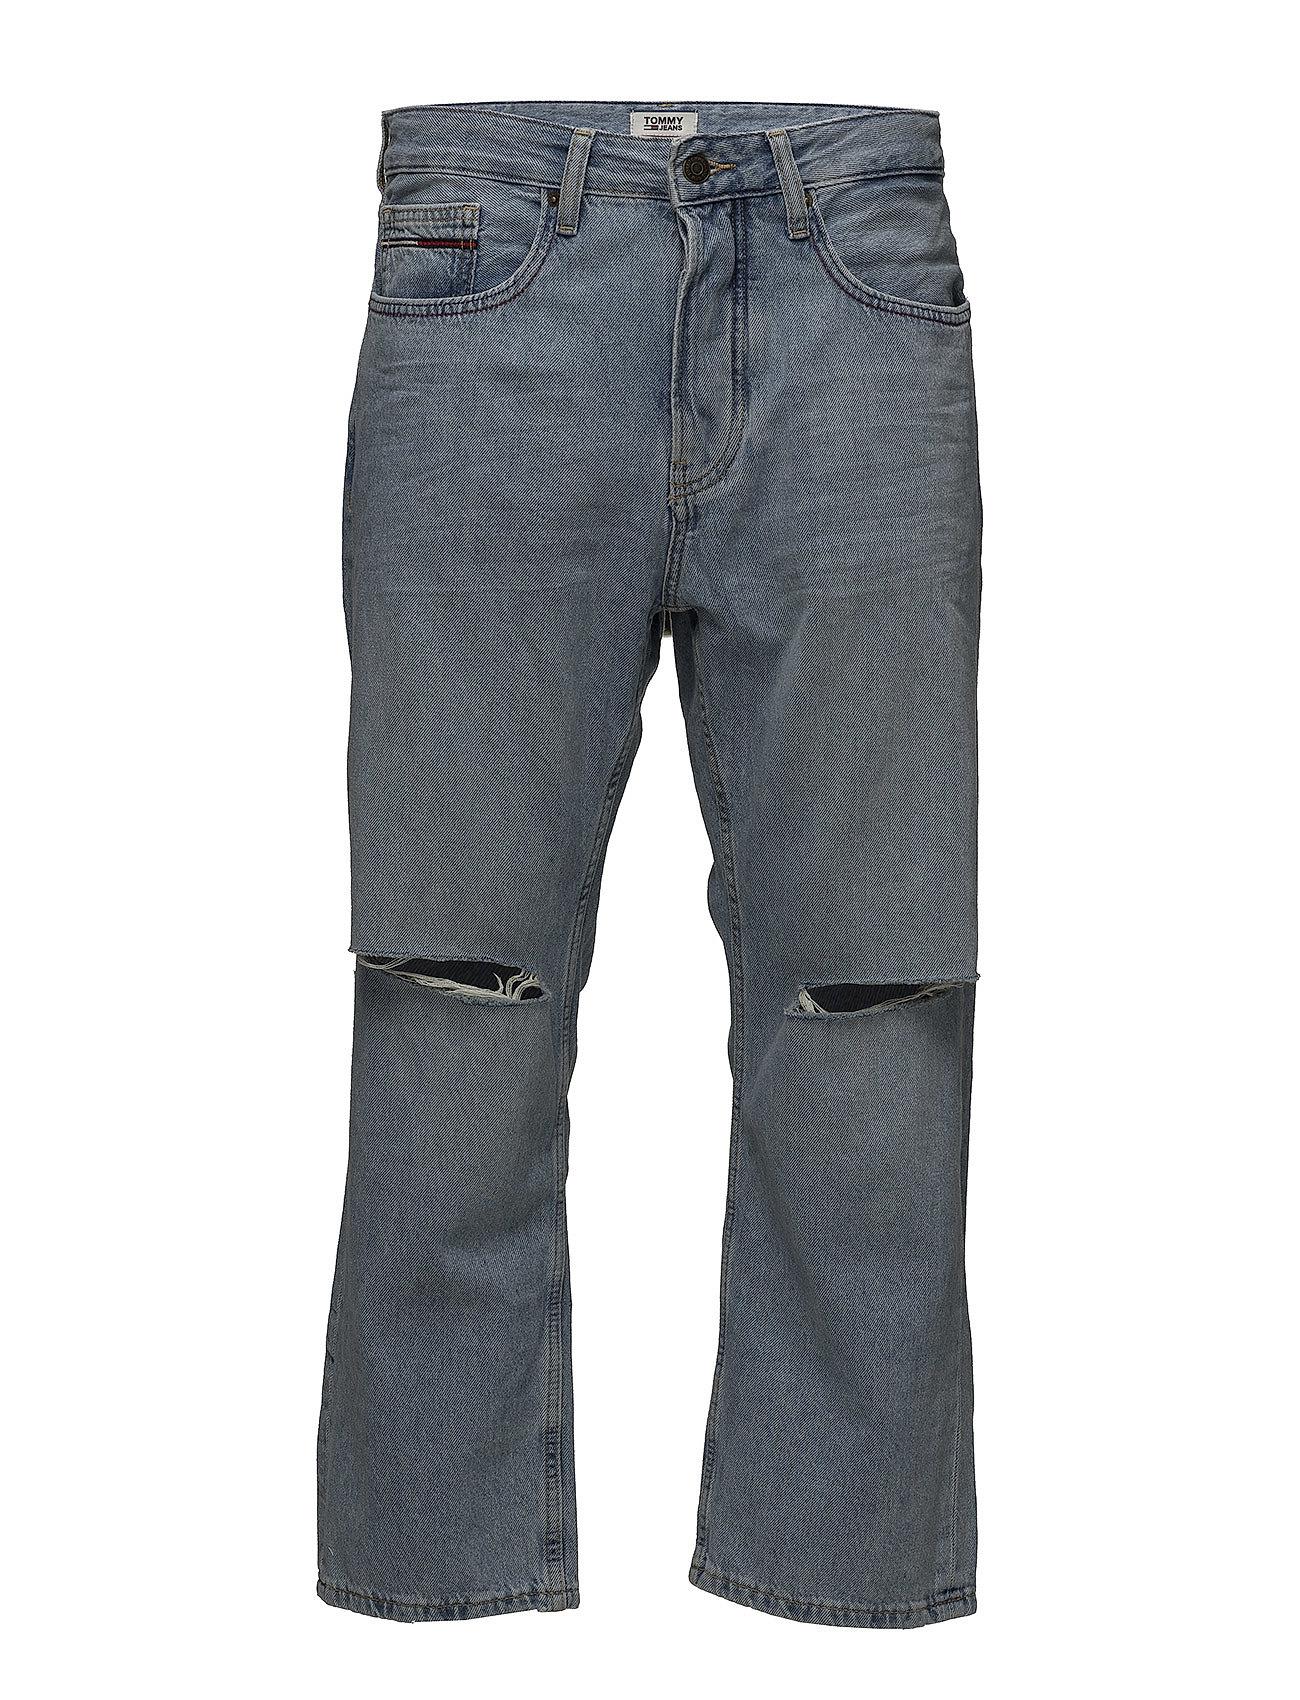 Tommy Jeans RELAXED BAGGY TJ 1951 MALBRI - MASON LIGHT BLUE RIGID